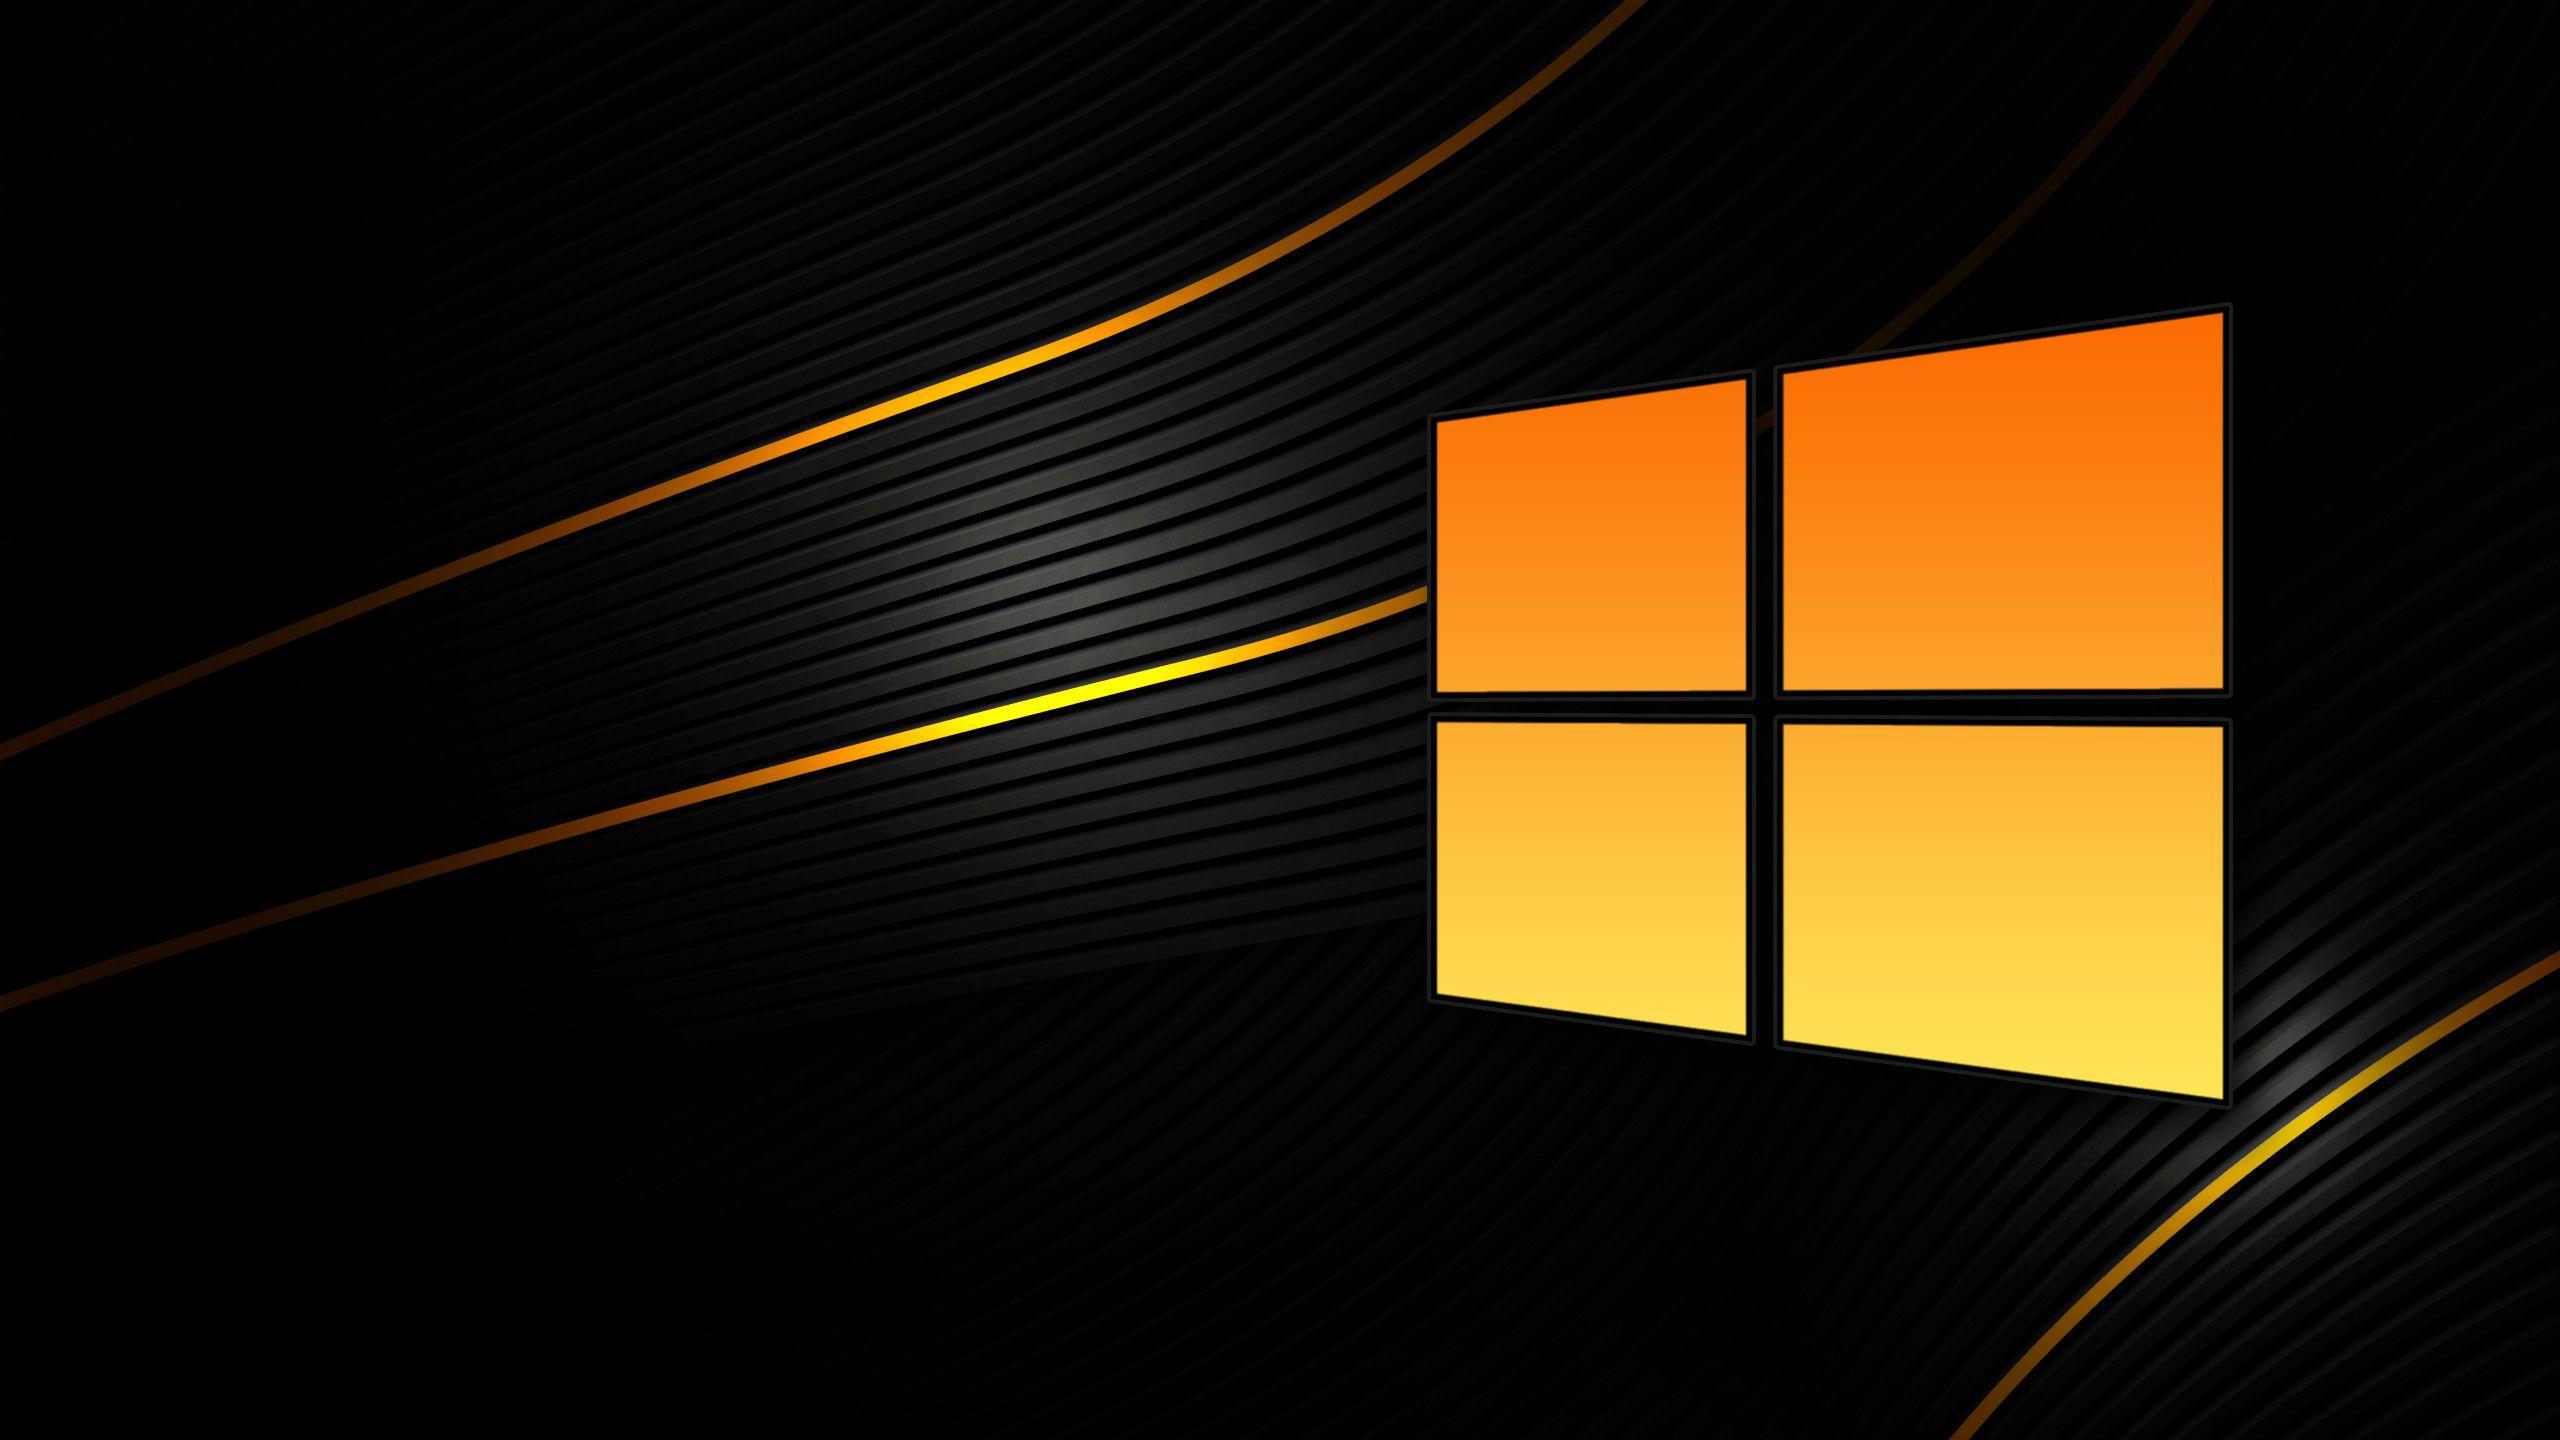 Windows Lock Screen Wallpapers Top Free Windows Lock Screen Backgrounds Wallpaperaccess